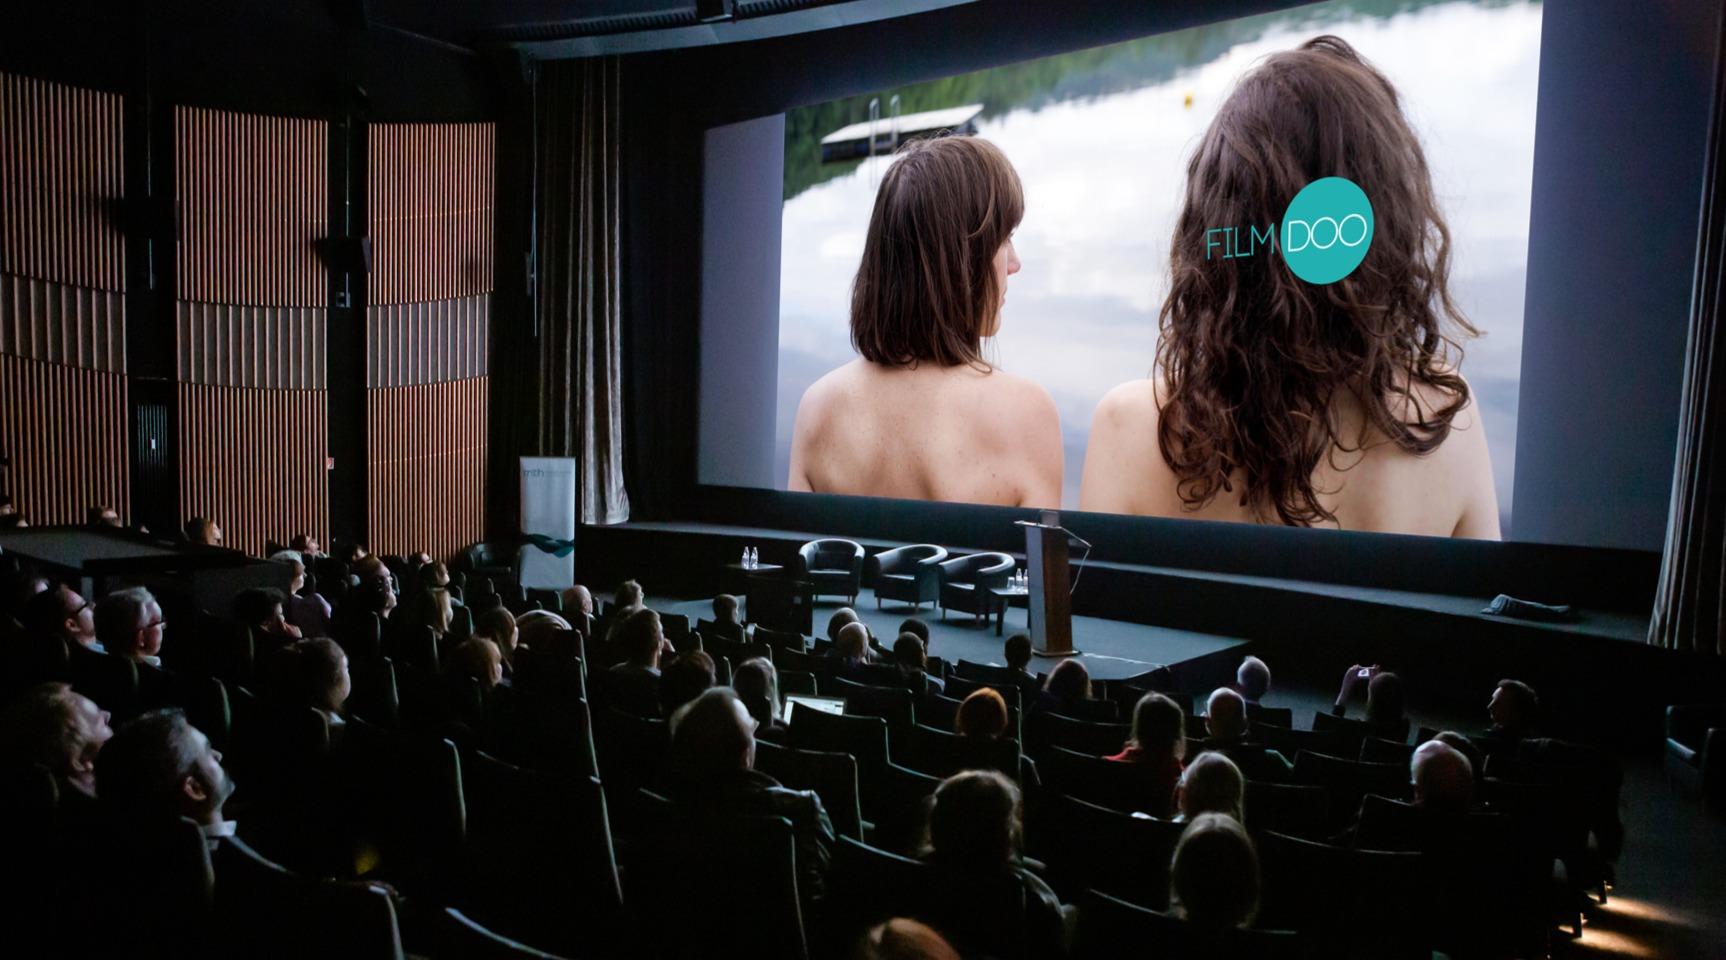 FilmDoo on screen